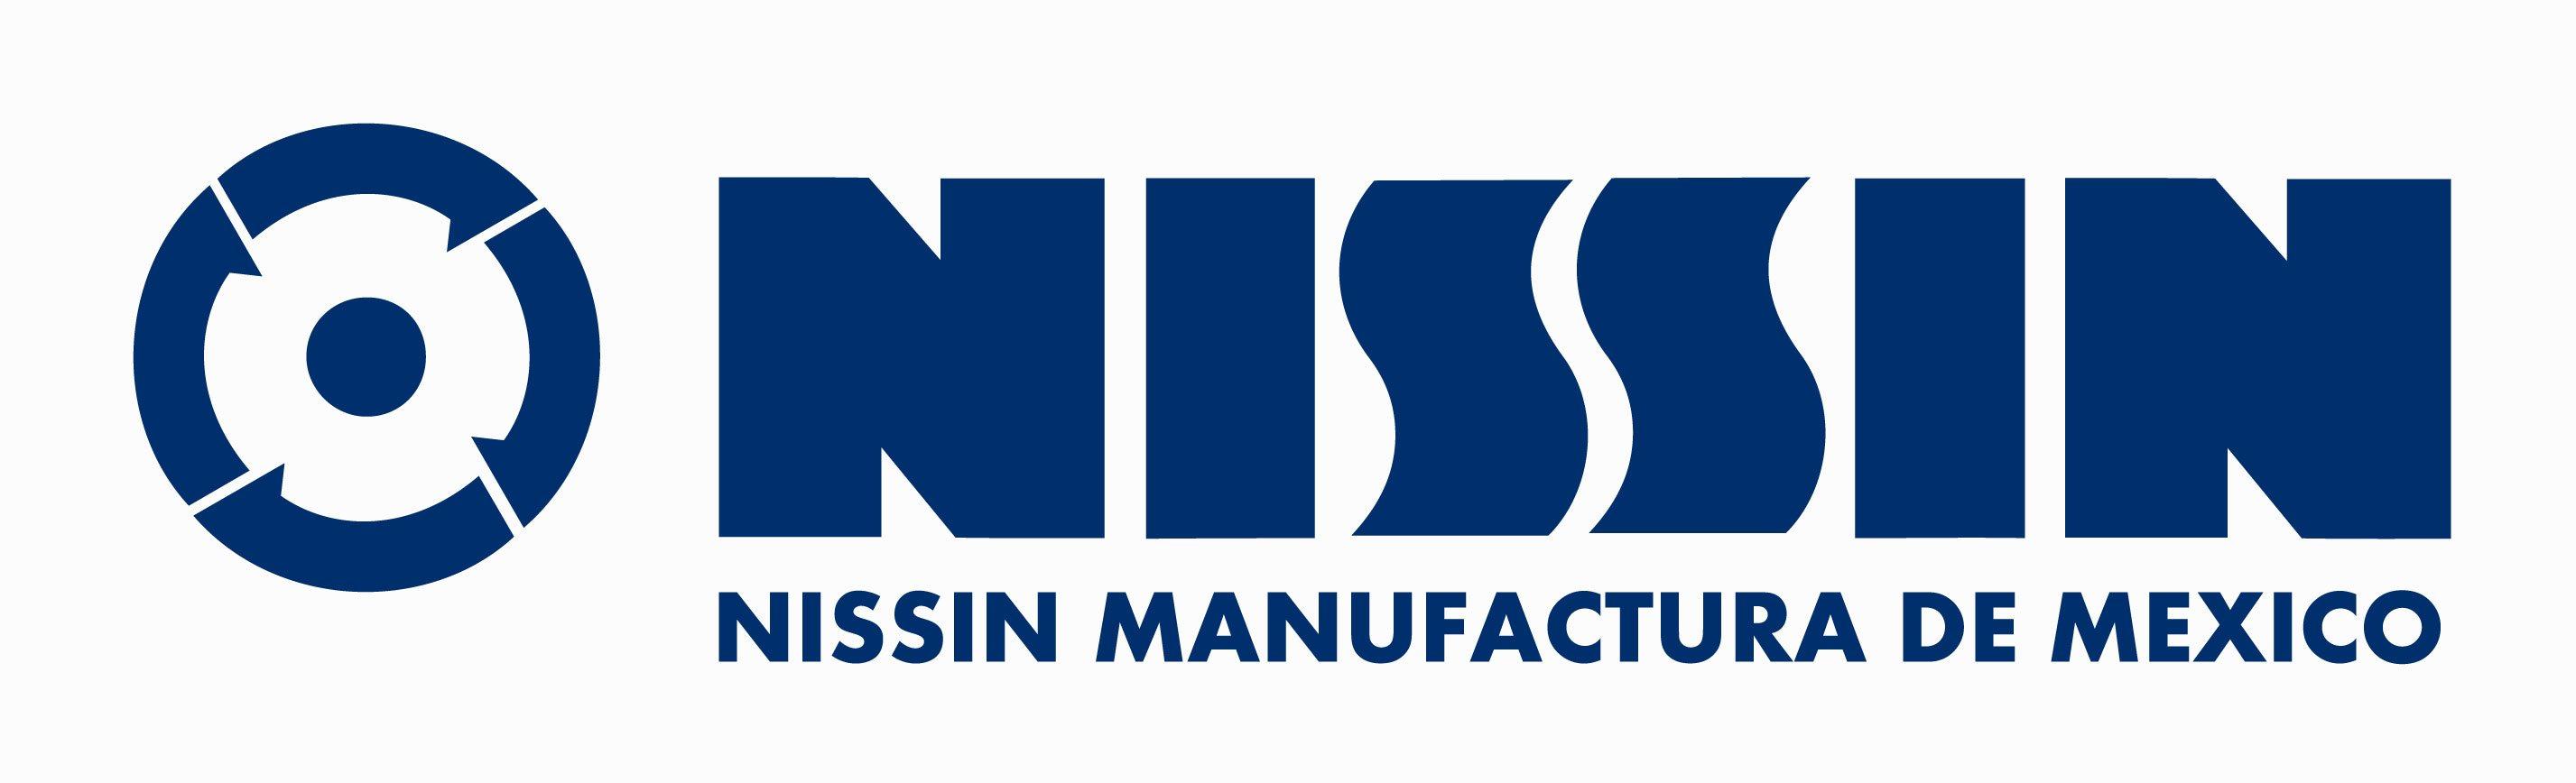 Nissin Manufactura de México S.A de C.V